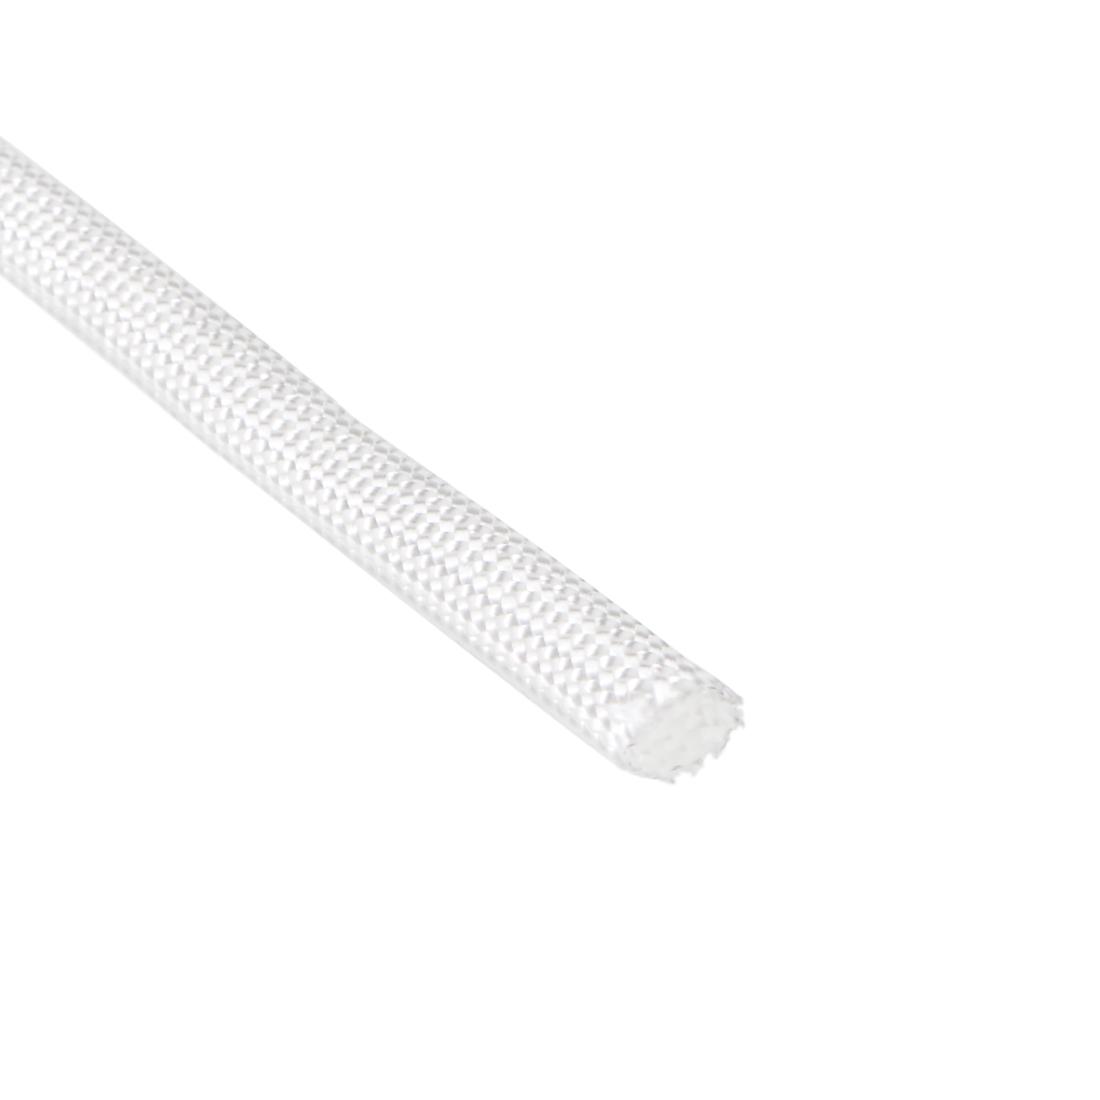 Silicone Rubber Fiberglass Insulation Retardant Sleeving 5mmx10M White